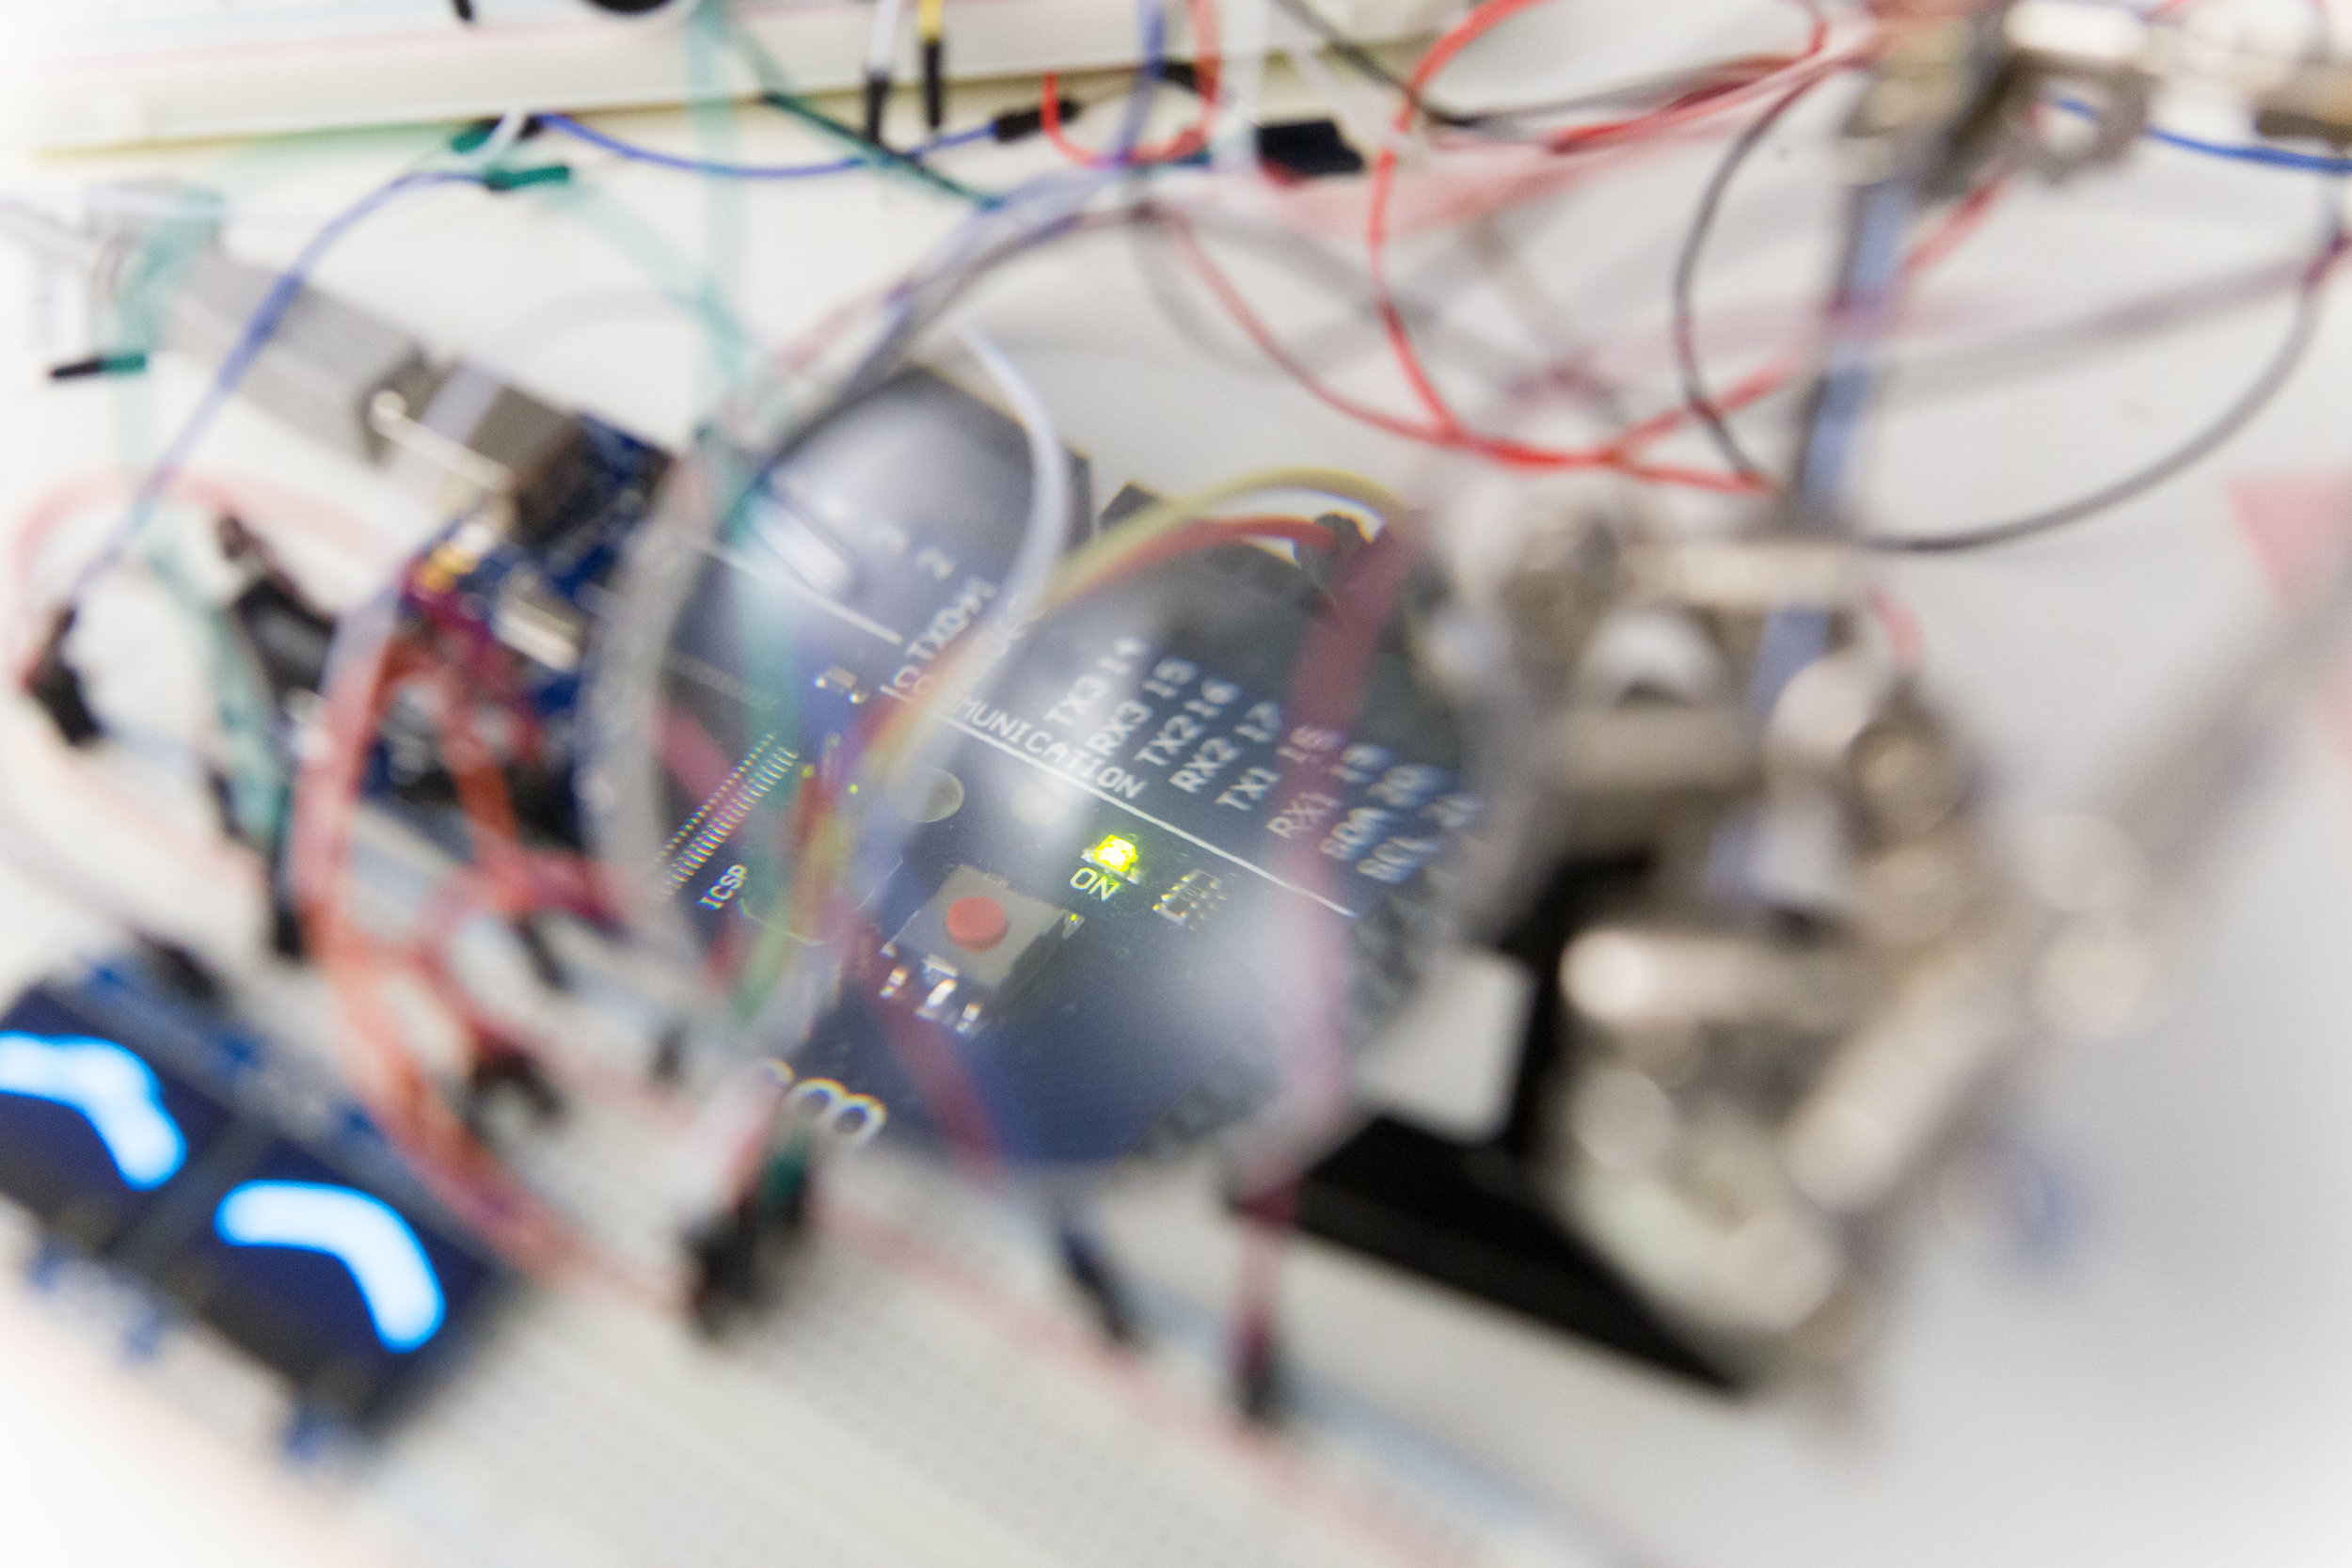 Human Machines - Machine Humans - Interaction Design & Rapid Prototyping